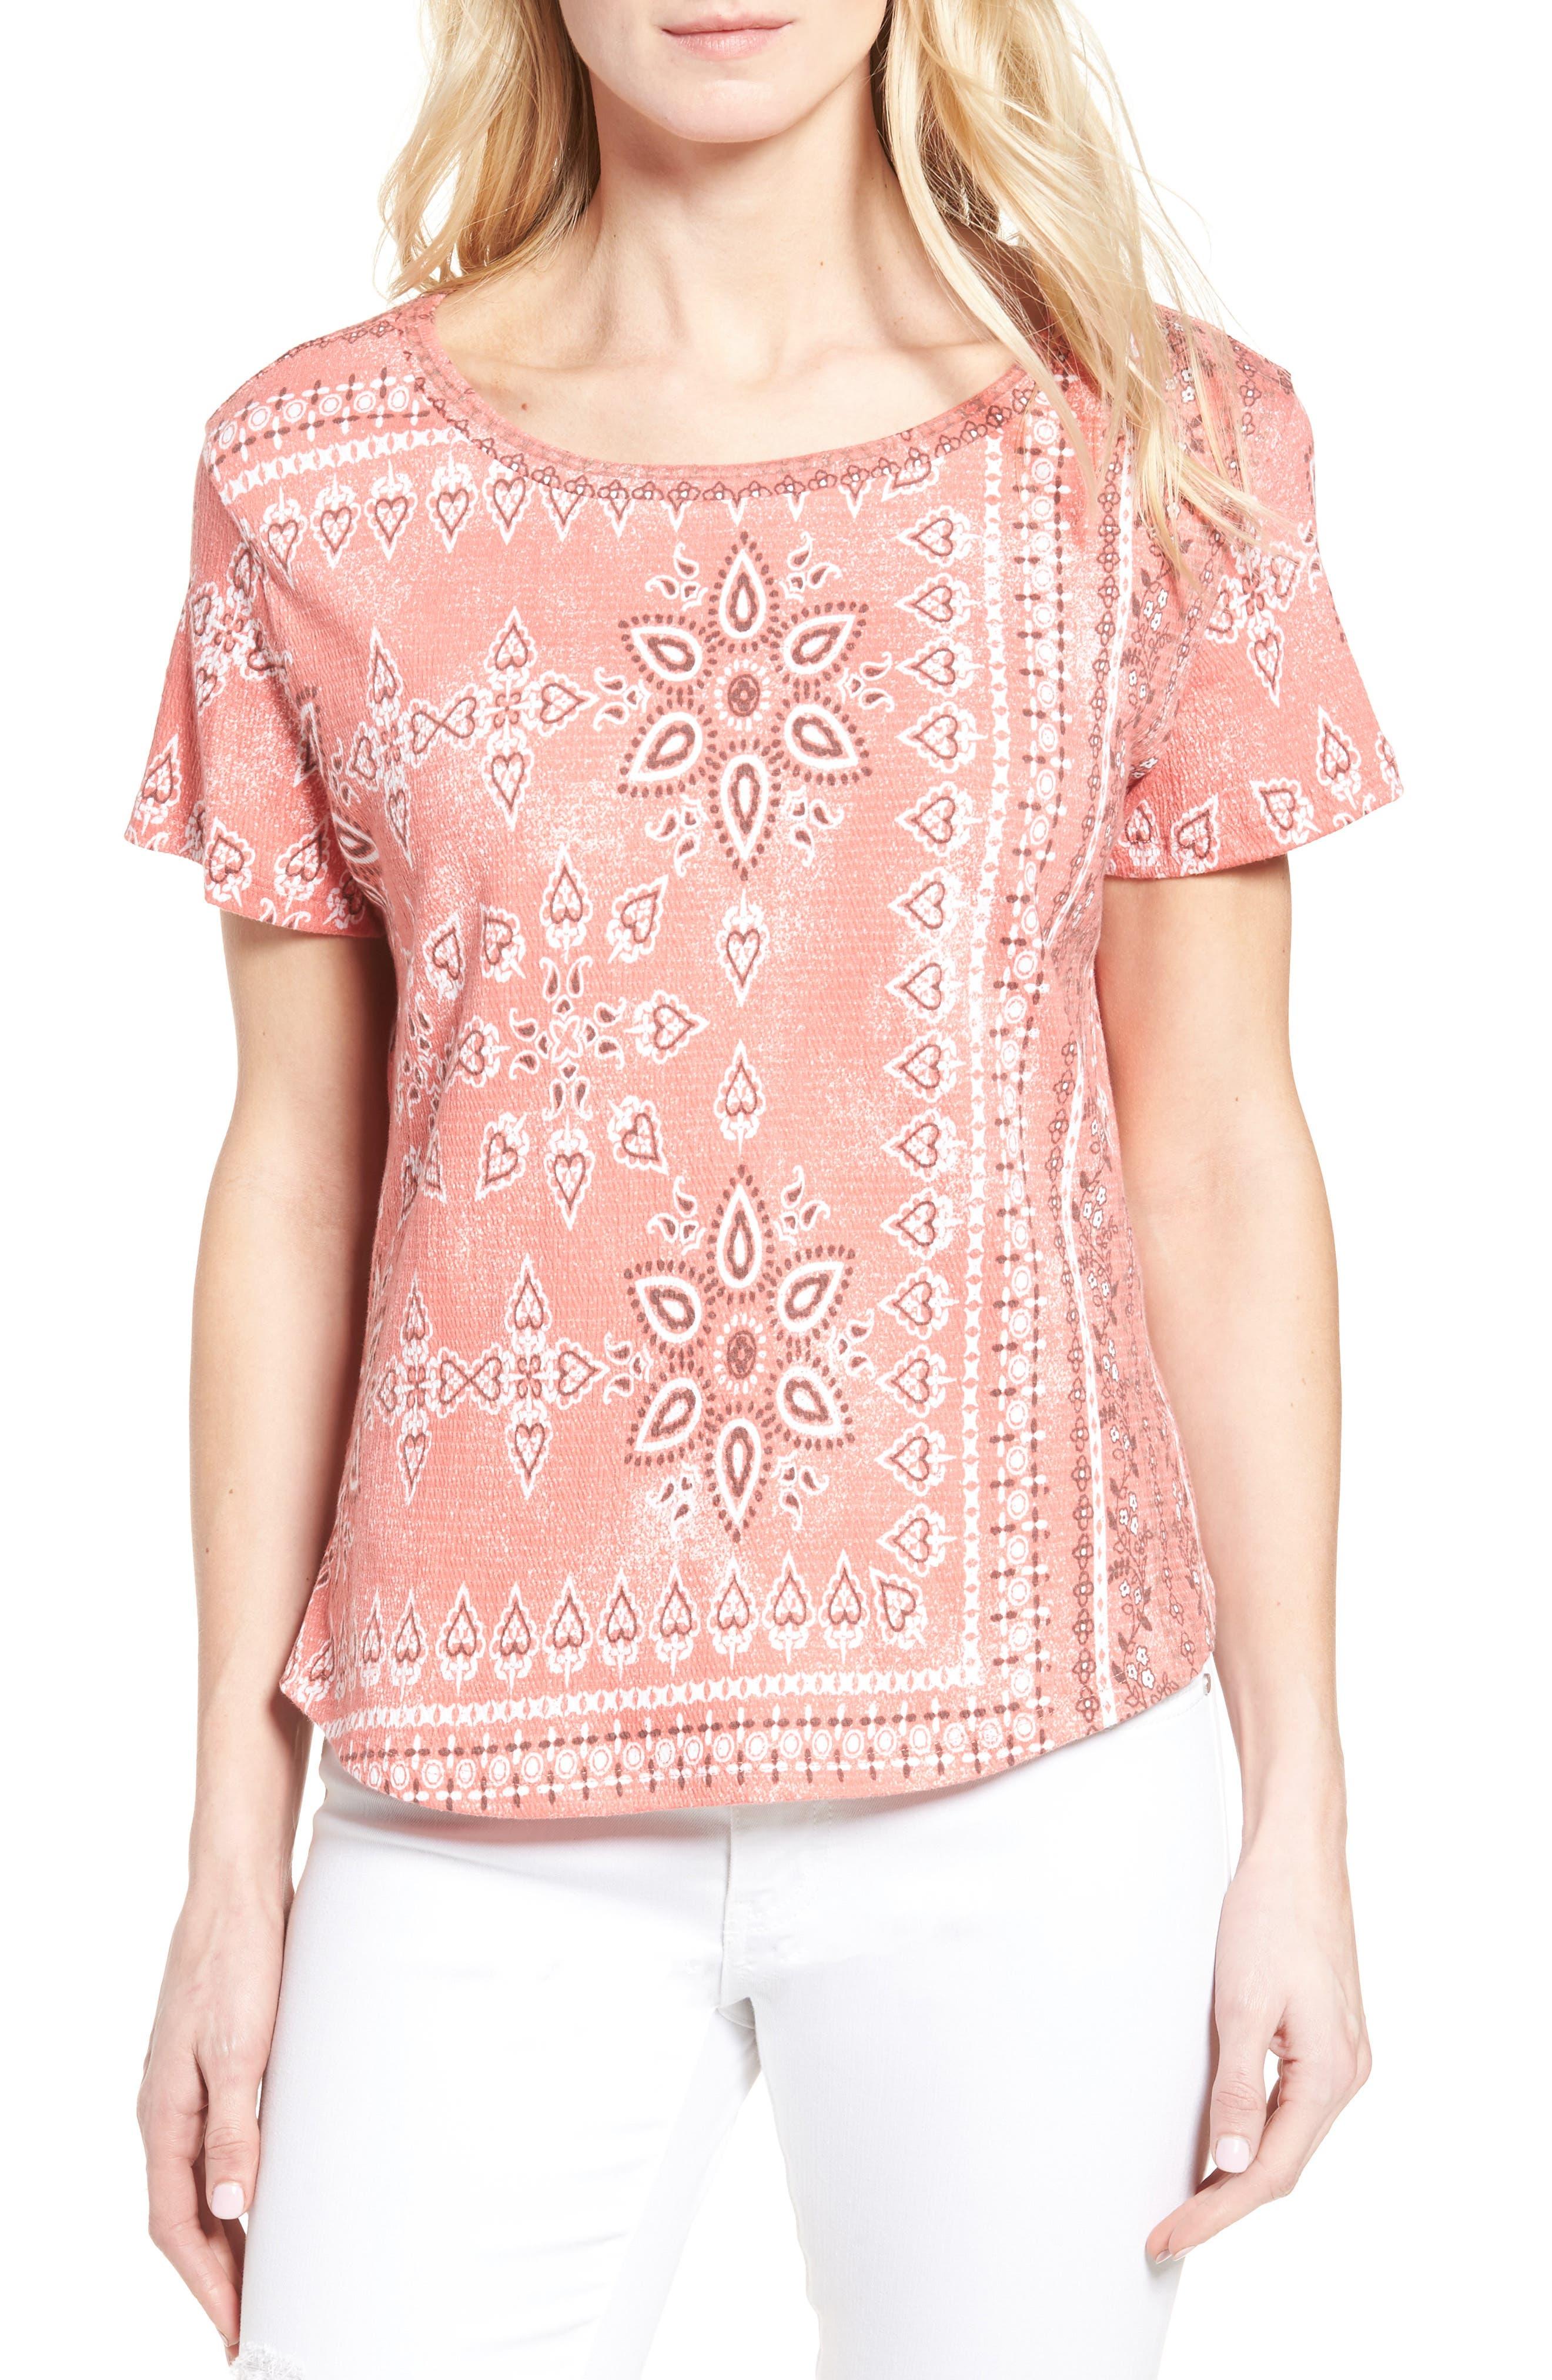 Main Image - Caslon® Print Crinkle Cotton Blend Top (Regular & Petite)